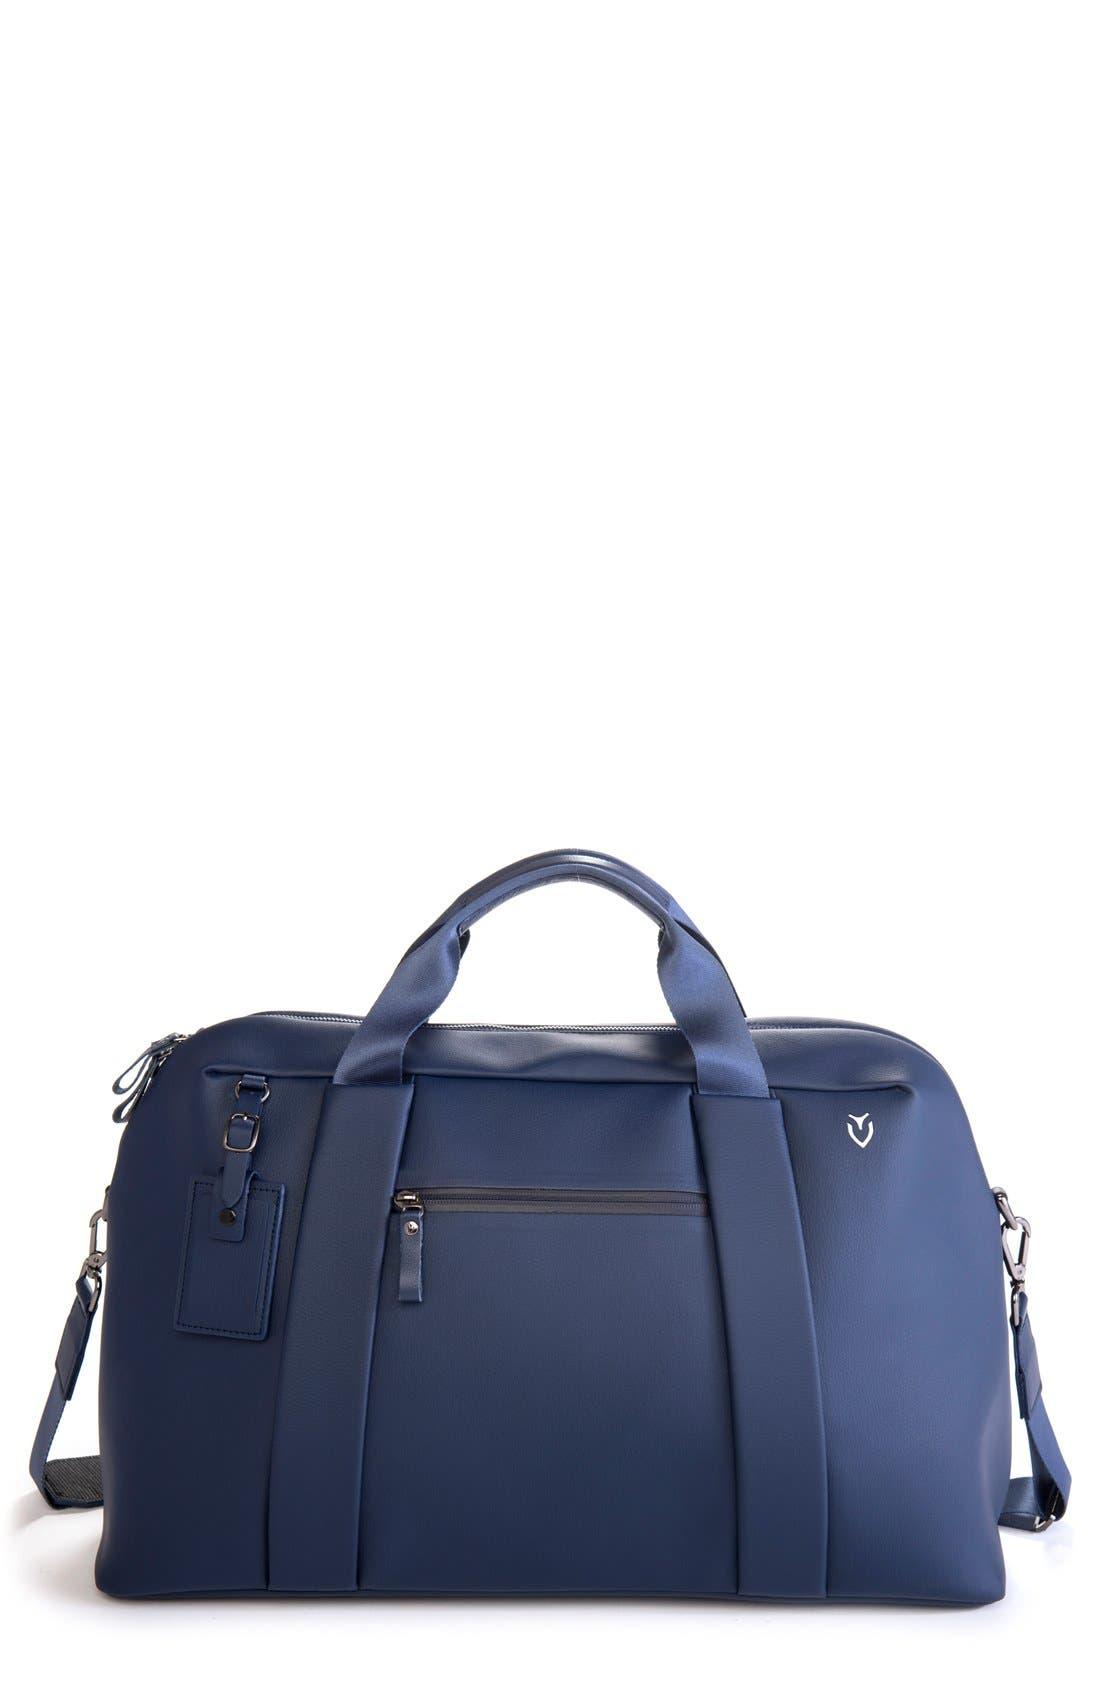 Main Image - Vessel 'Signature' Large Duffel Bag